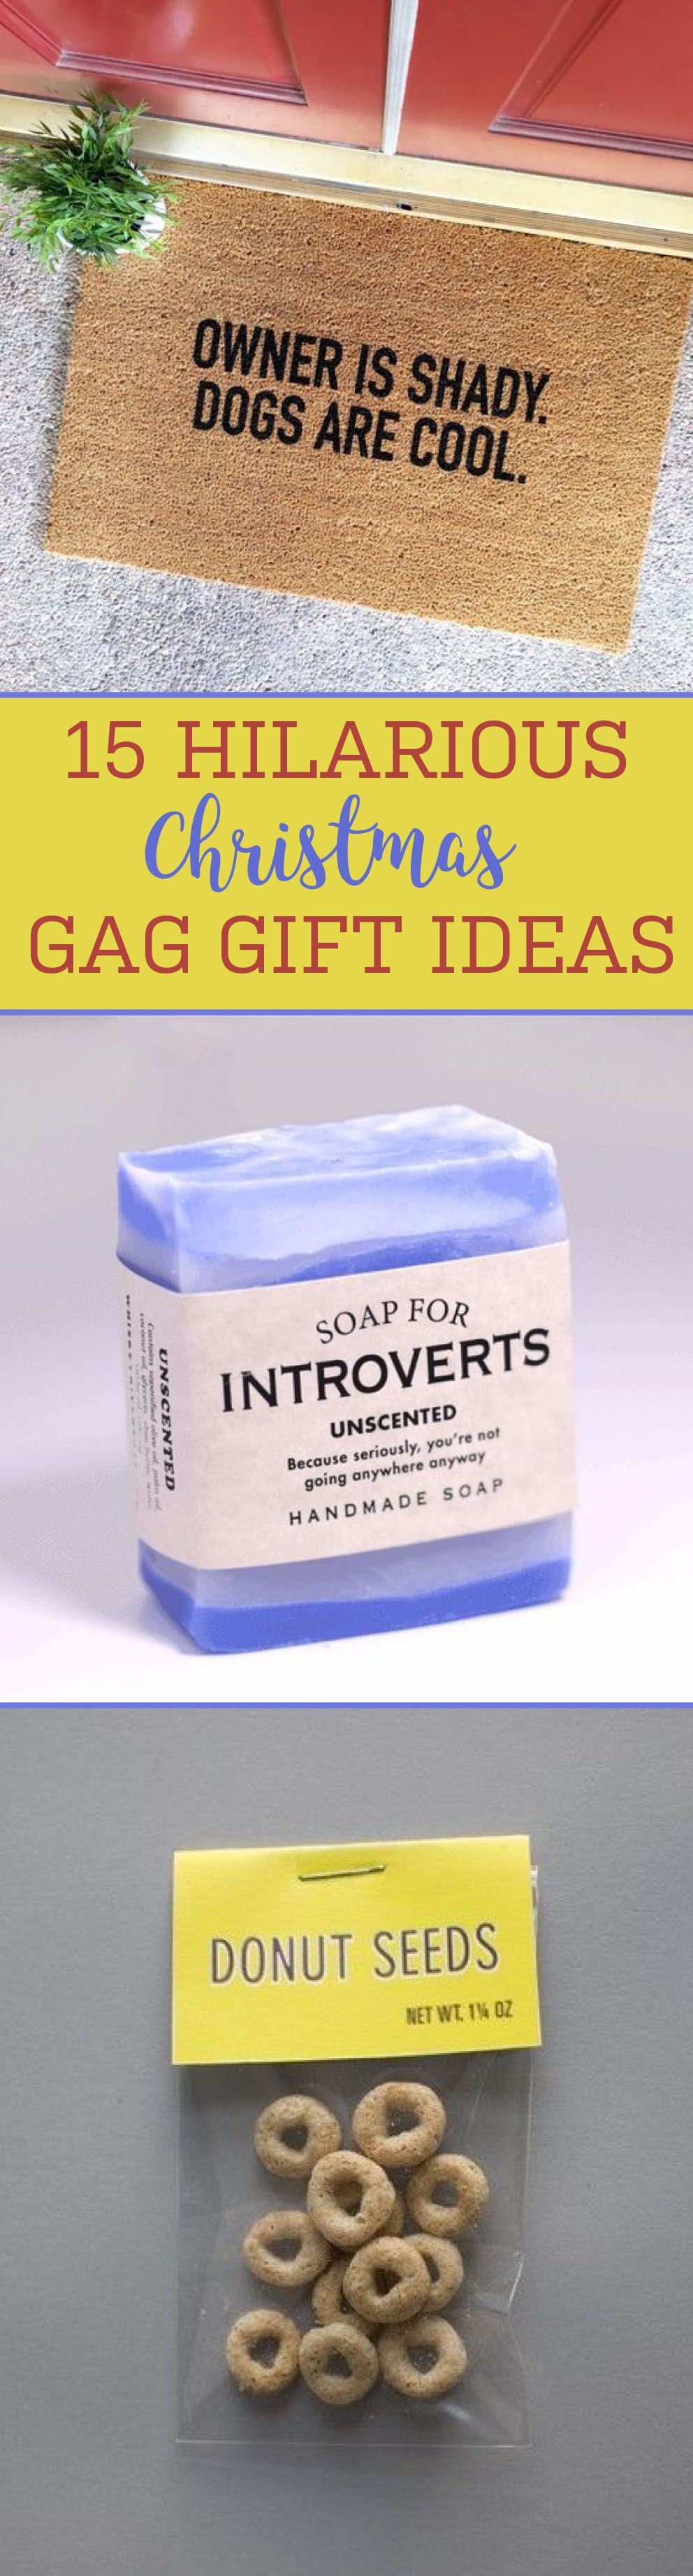 15 Hilarious Christmas Gag Gift Ideas   crafts   Gag gifts christmas ...